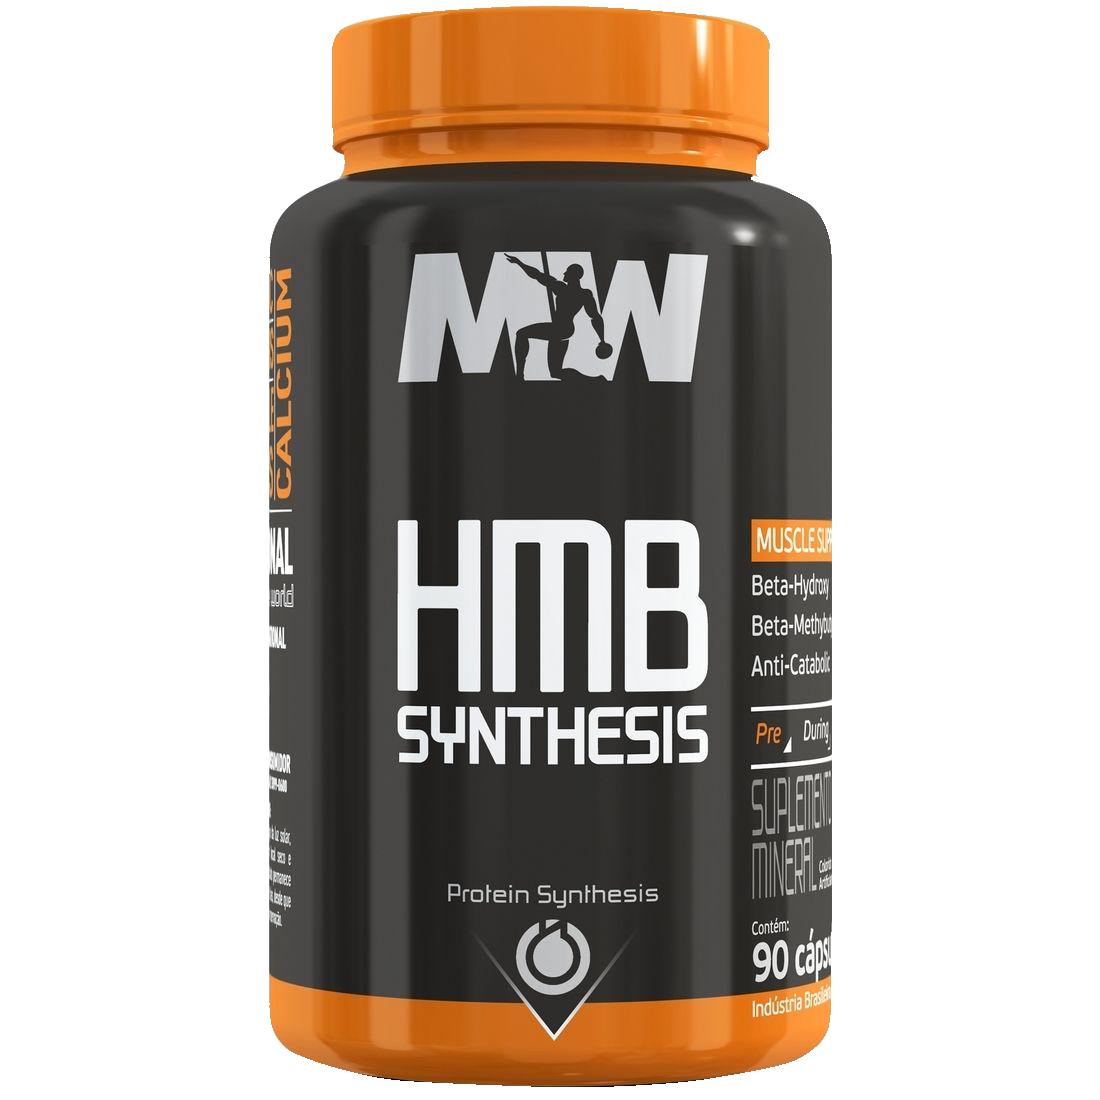 HMB synthesis 90 cápsulas - Midway